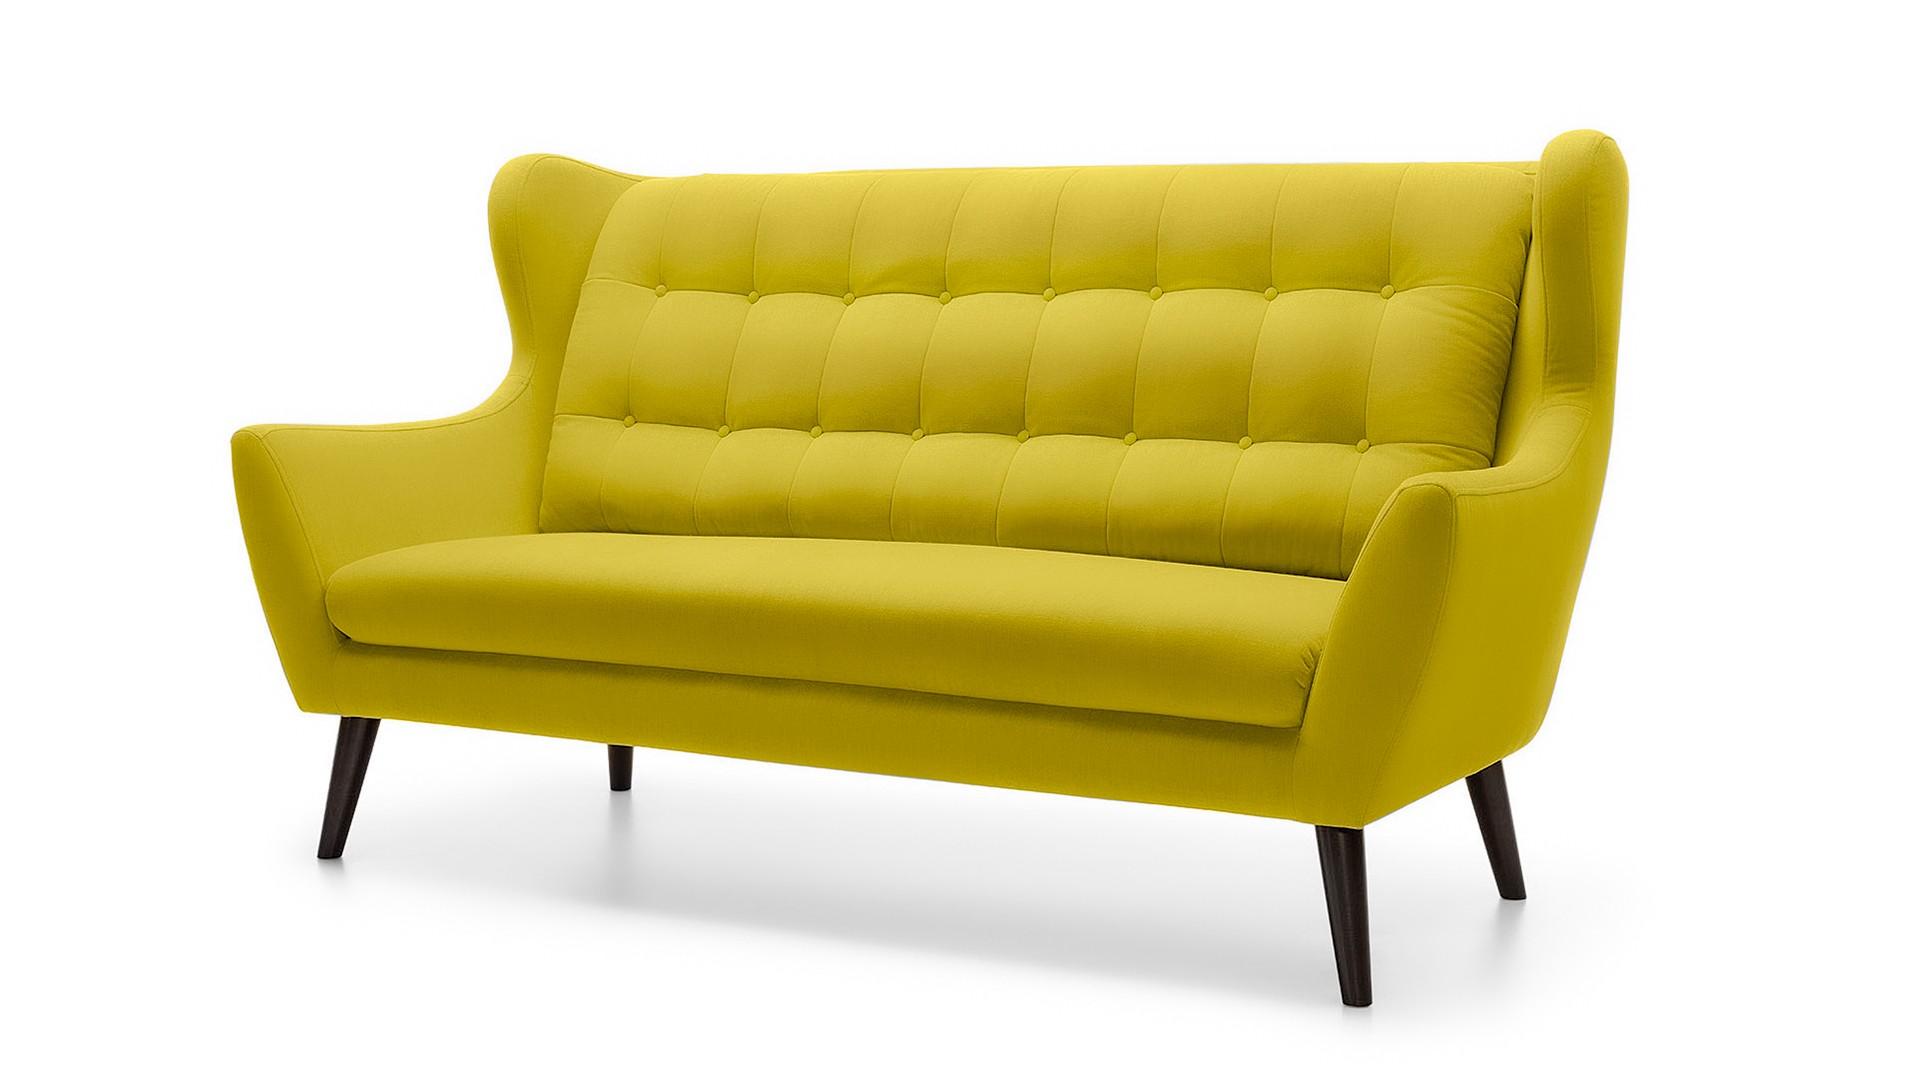 Диван ньюкасл (fiesta) желтый 197x94x107 см.